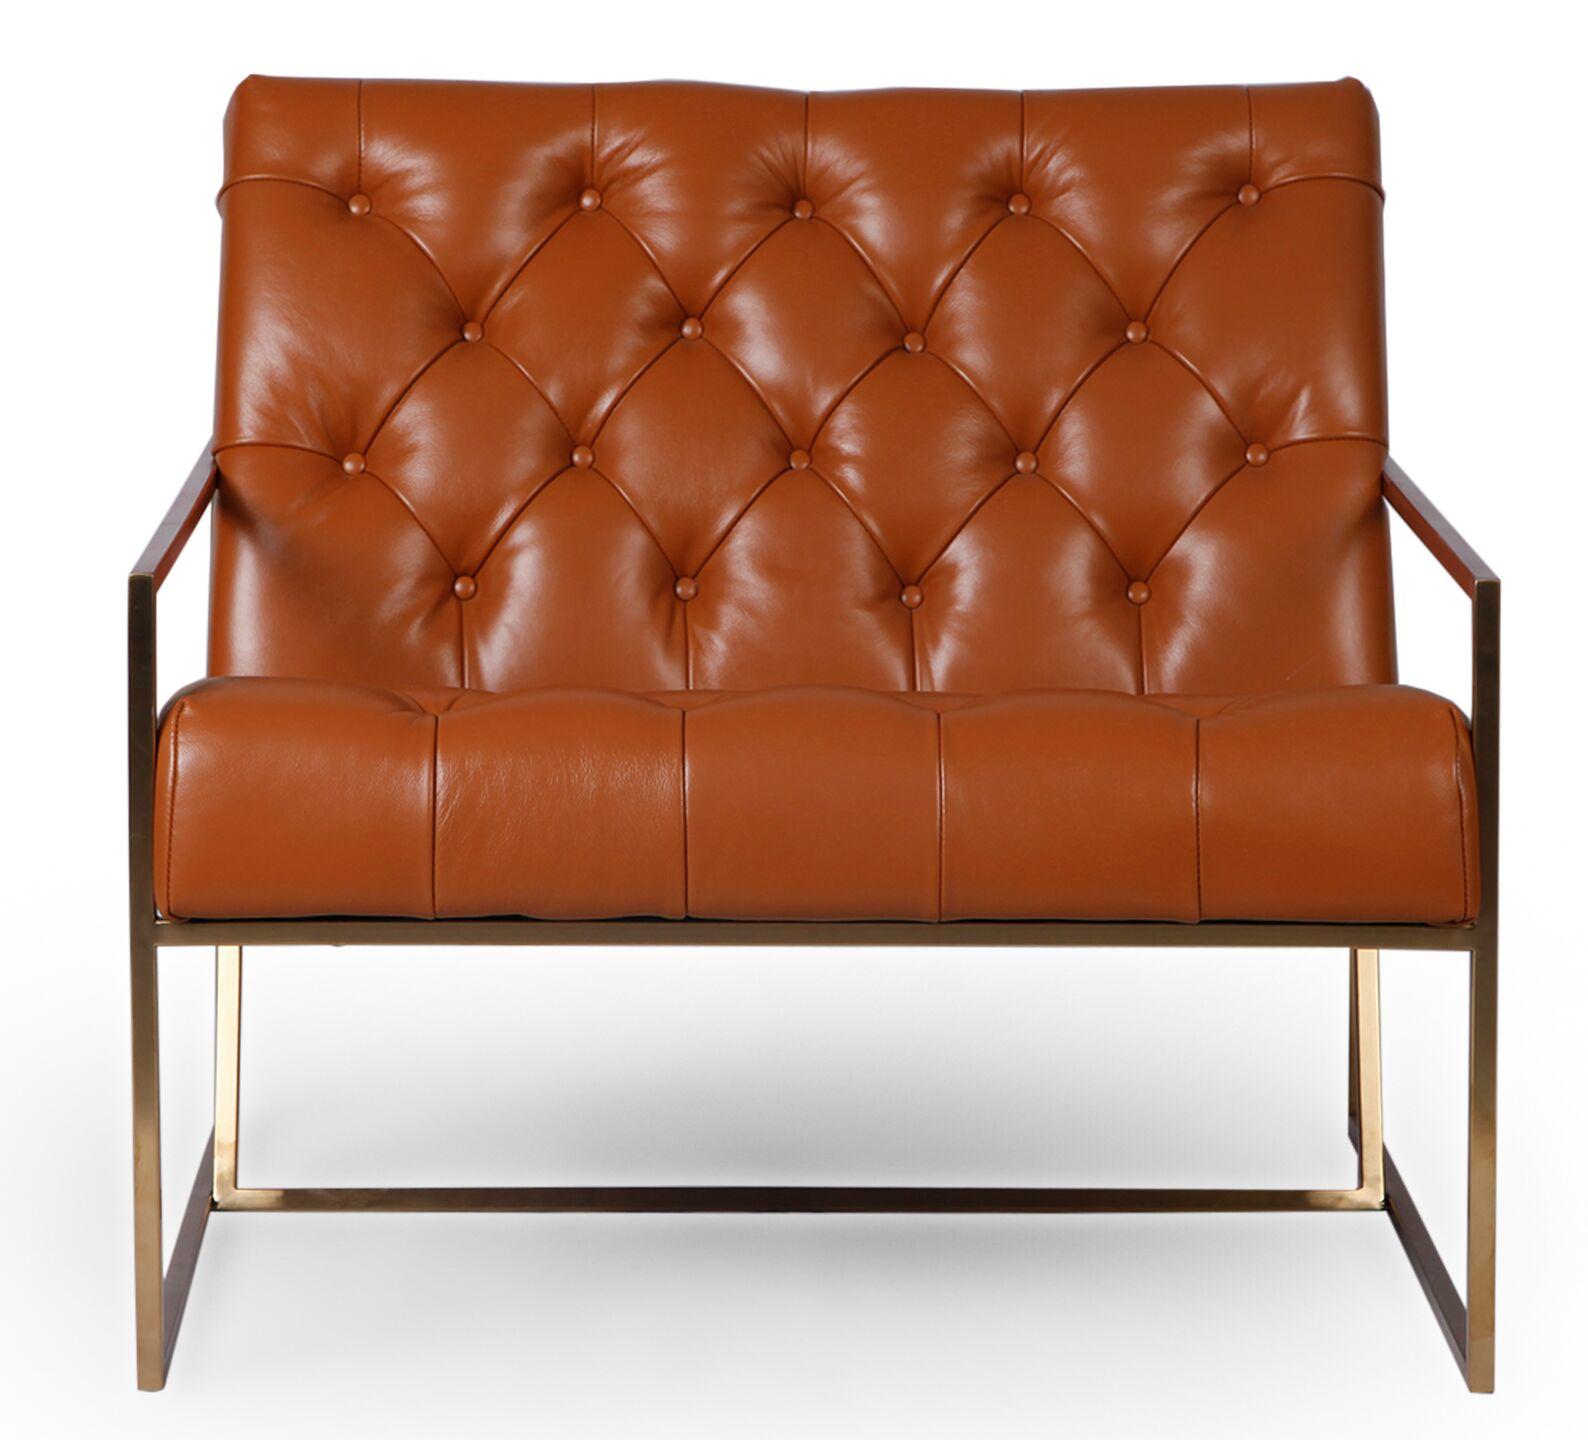 Callington Mid Century Modern Armchair Upholstery Color: Caramel, Leg Color: Gold Metal